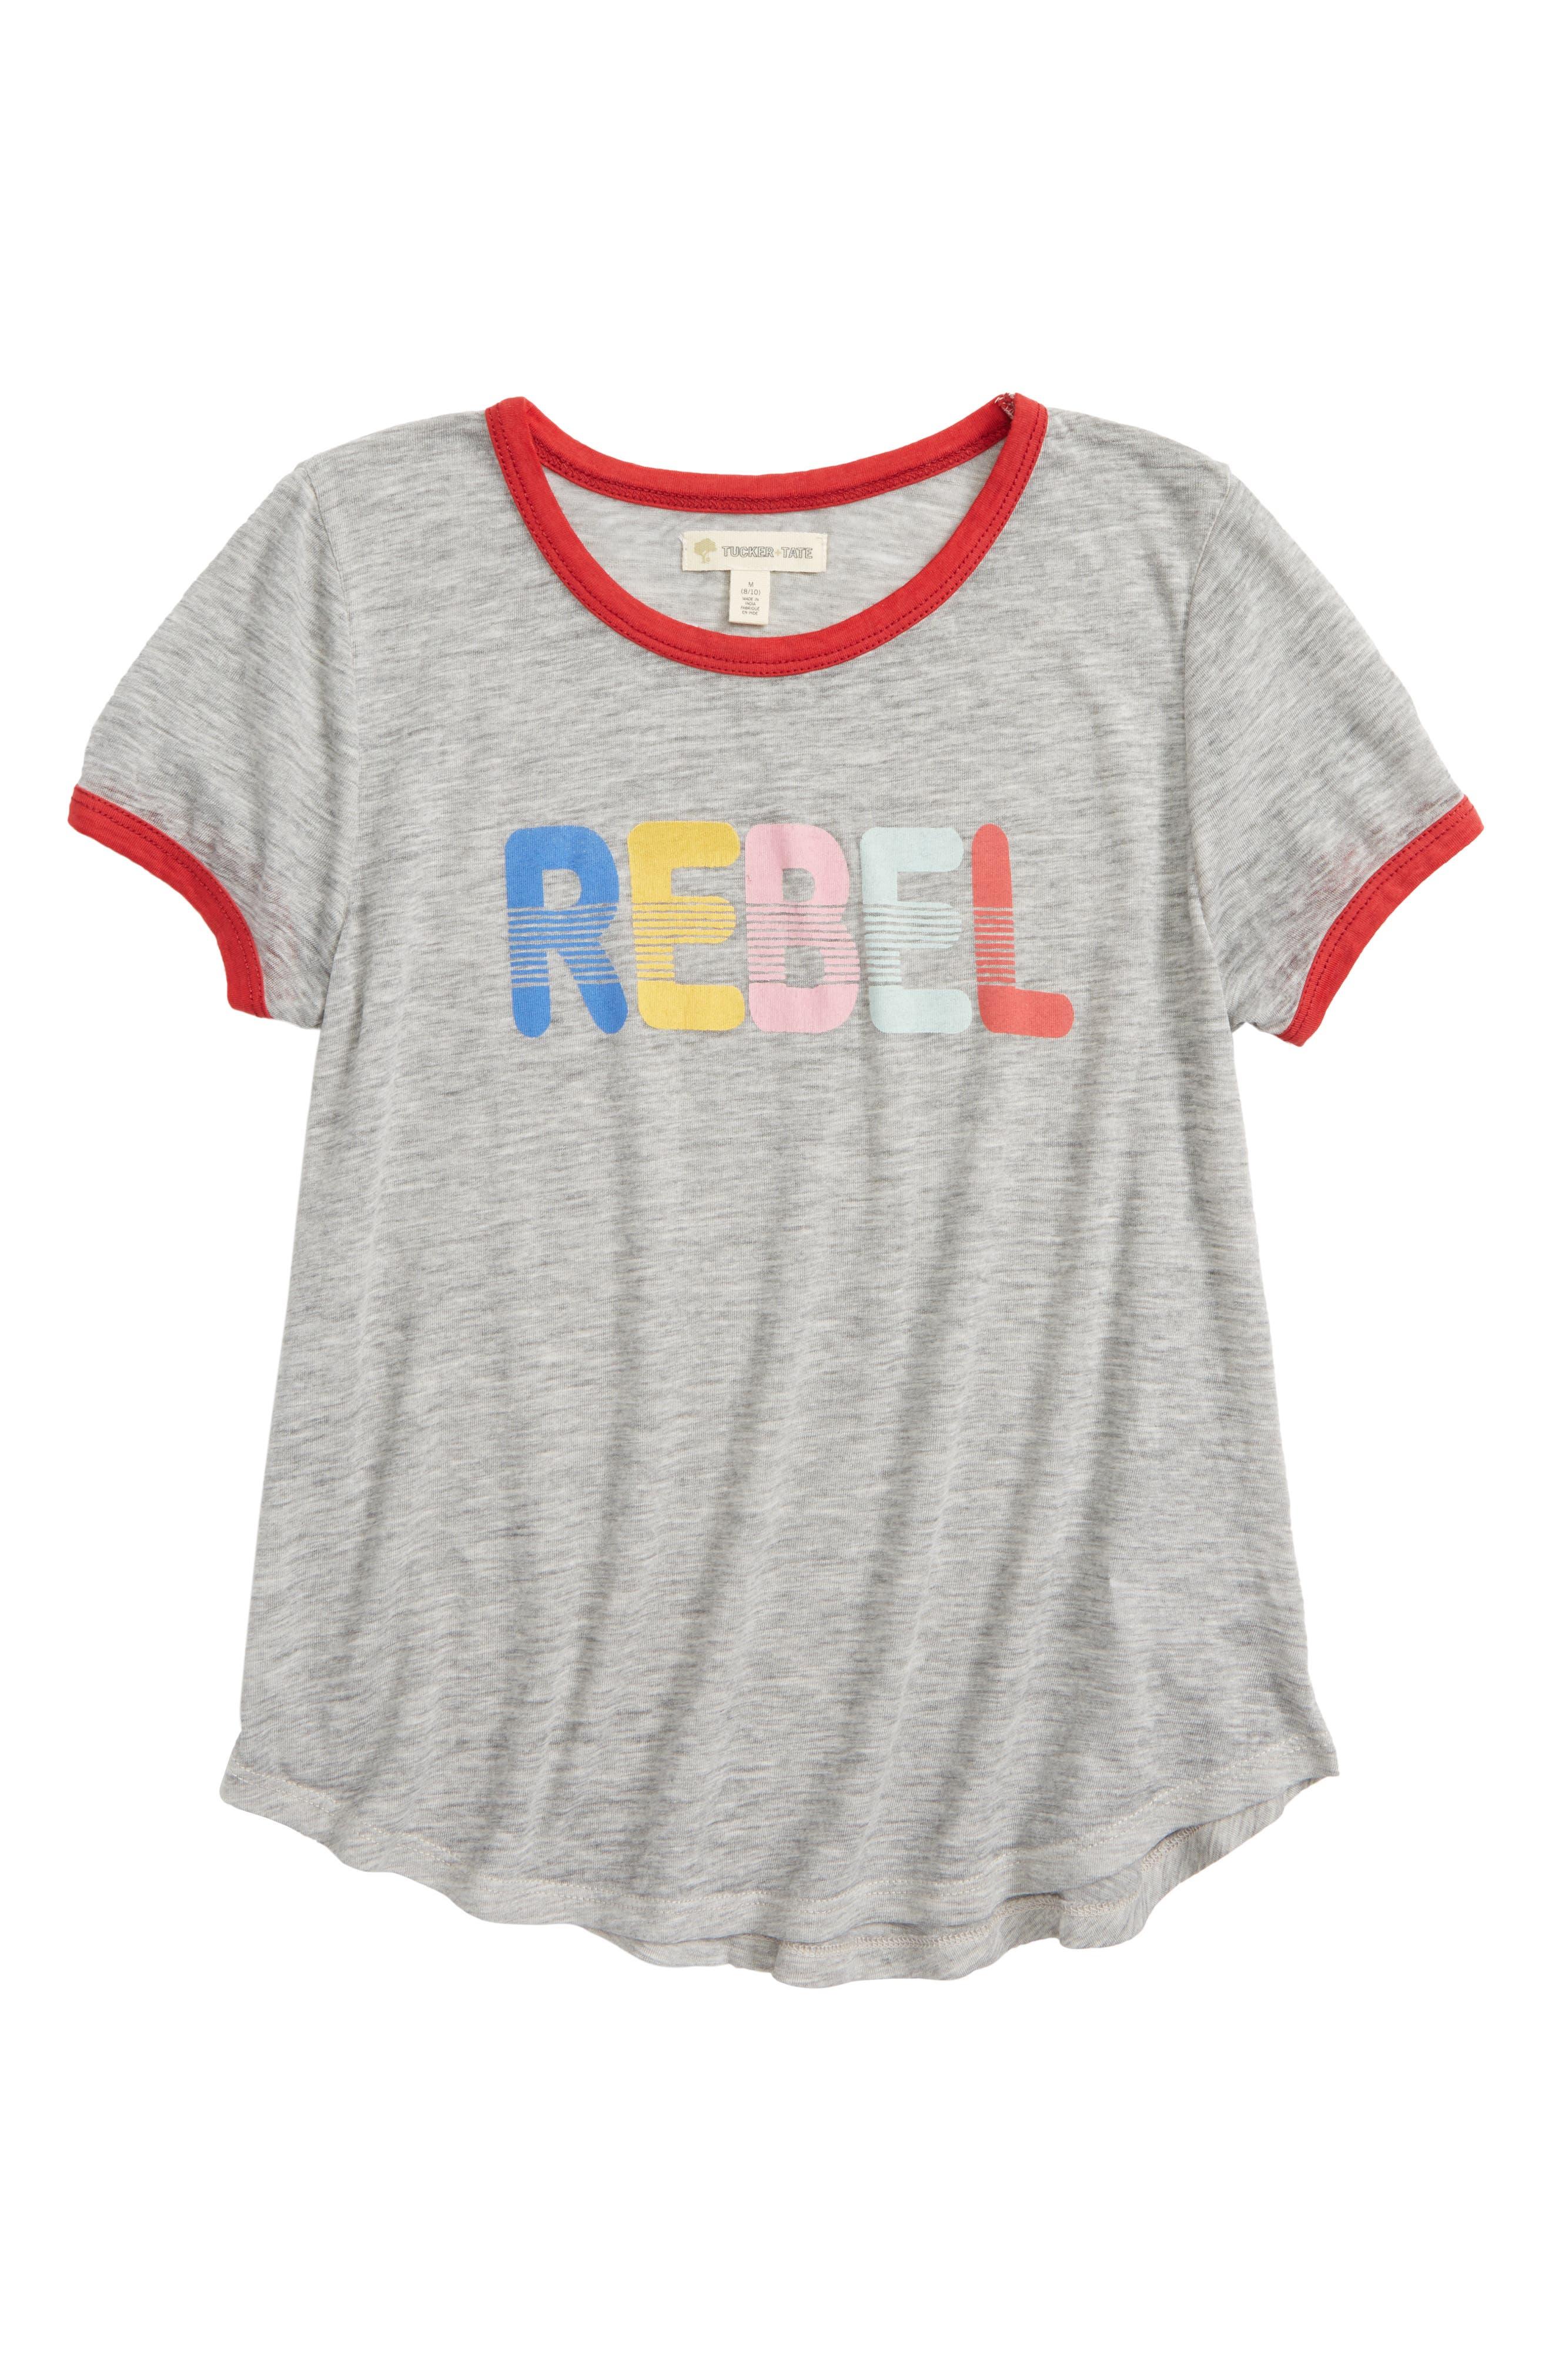 Rebel Ringer Tee,                             Main thumbnail 1, color,                             050